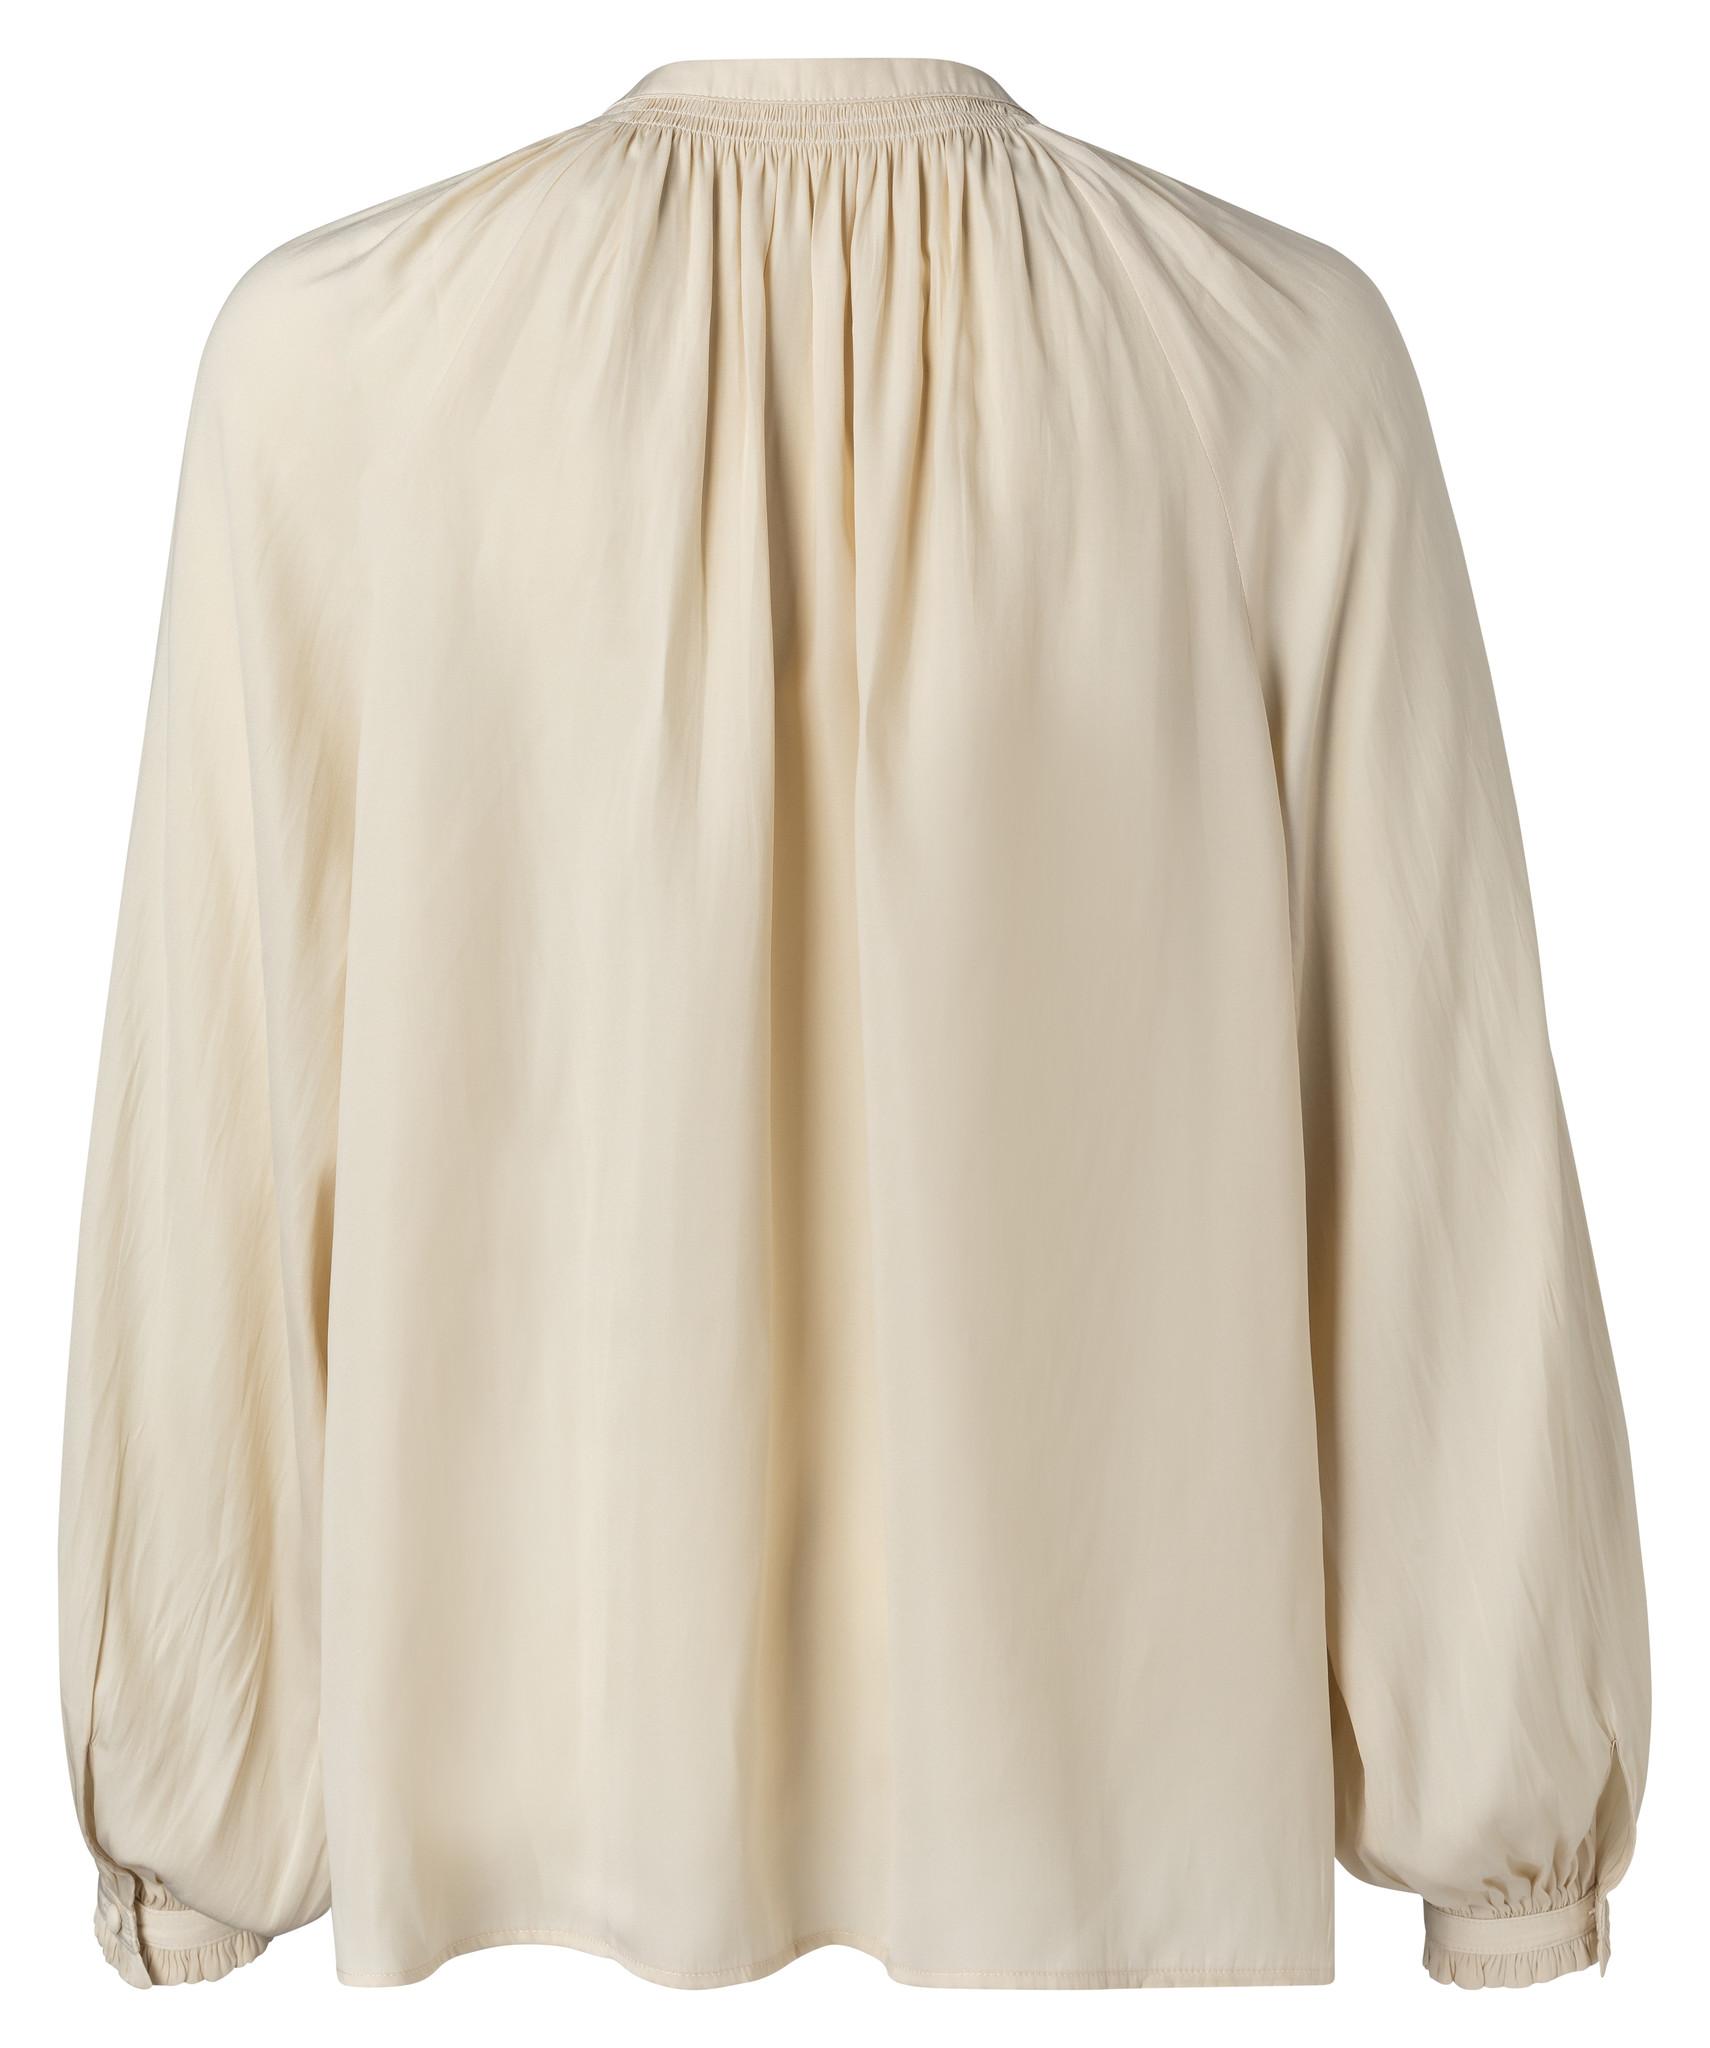 yaya Drapy tunic top 1901412-113-3